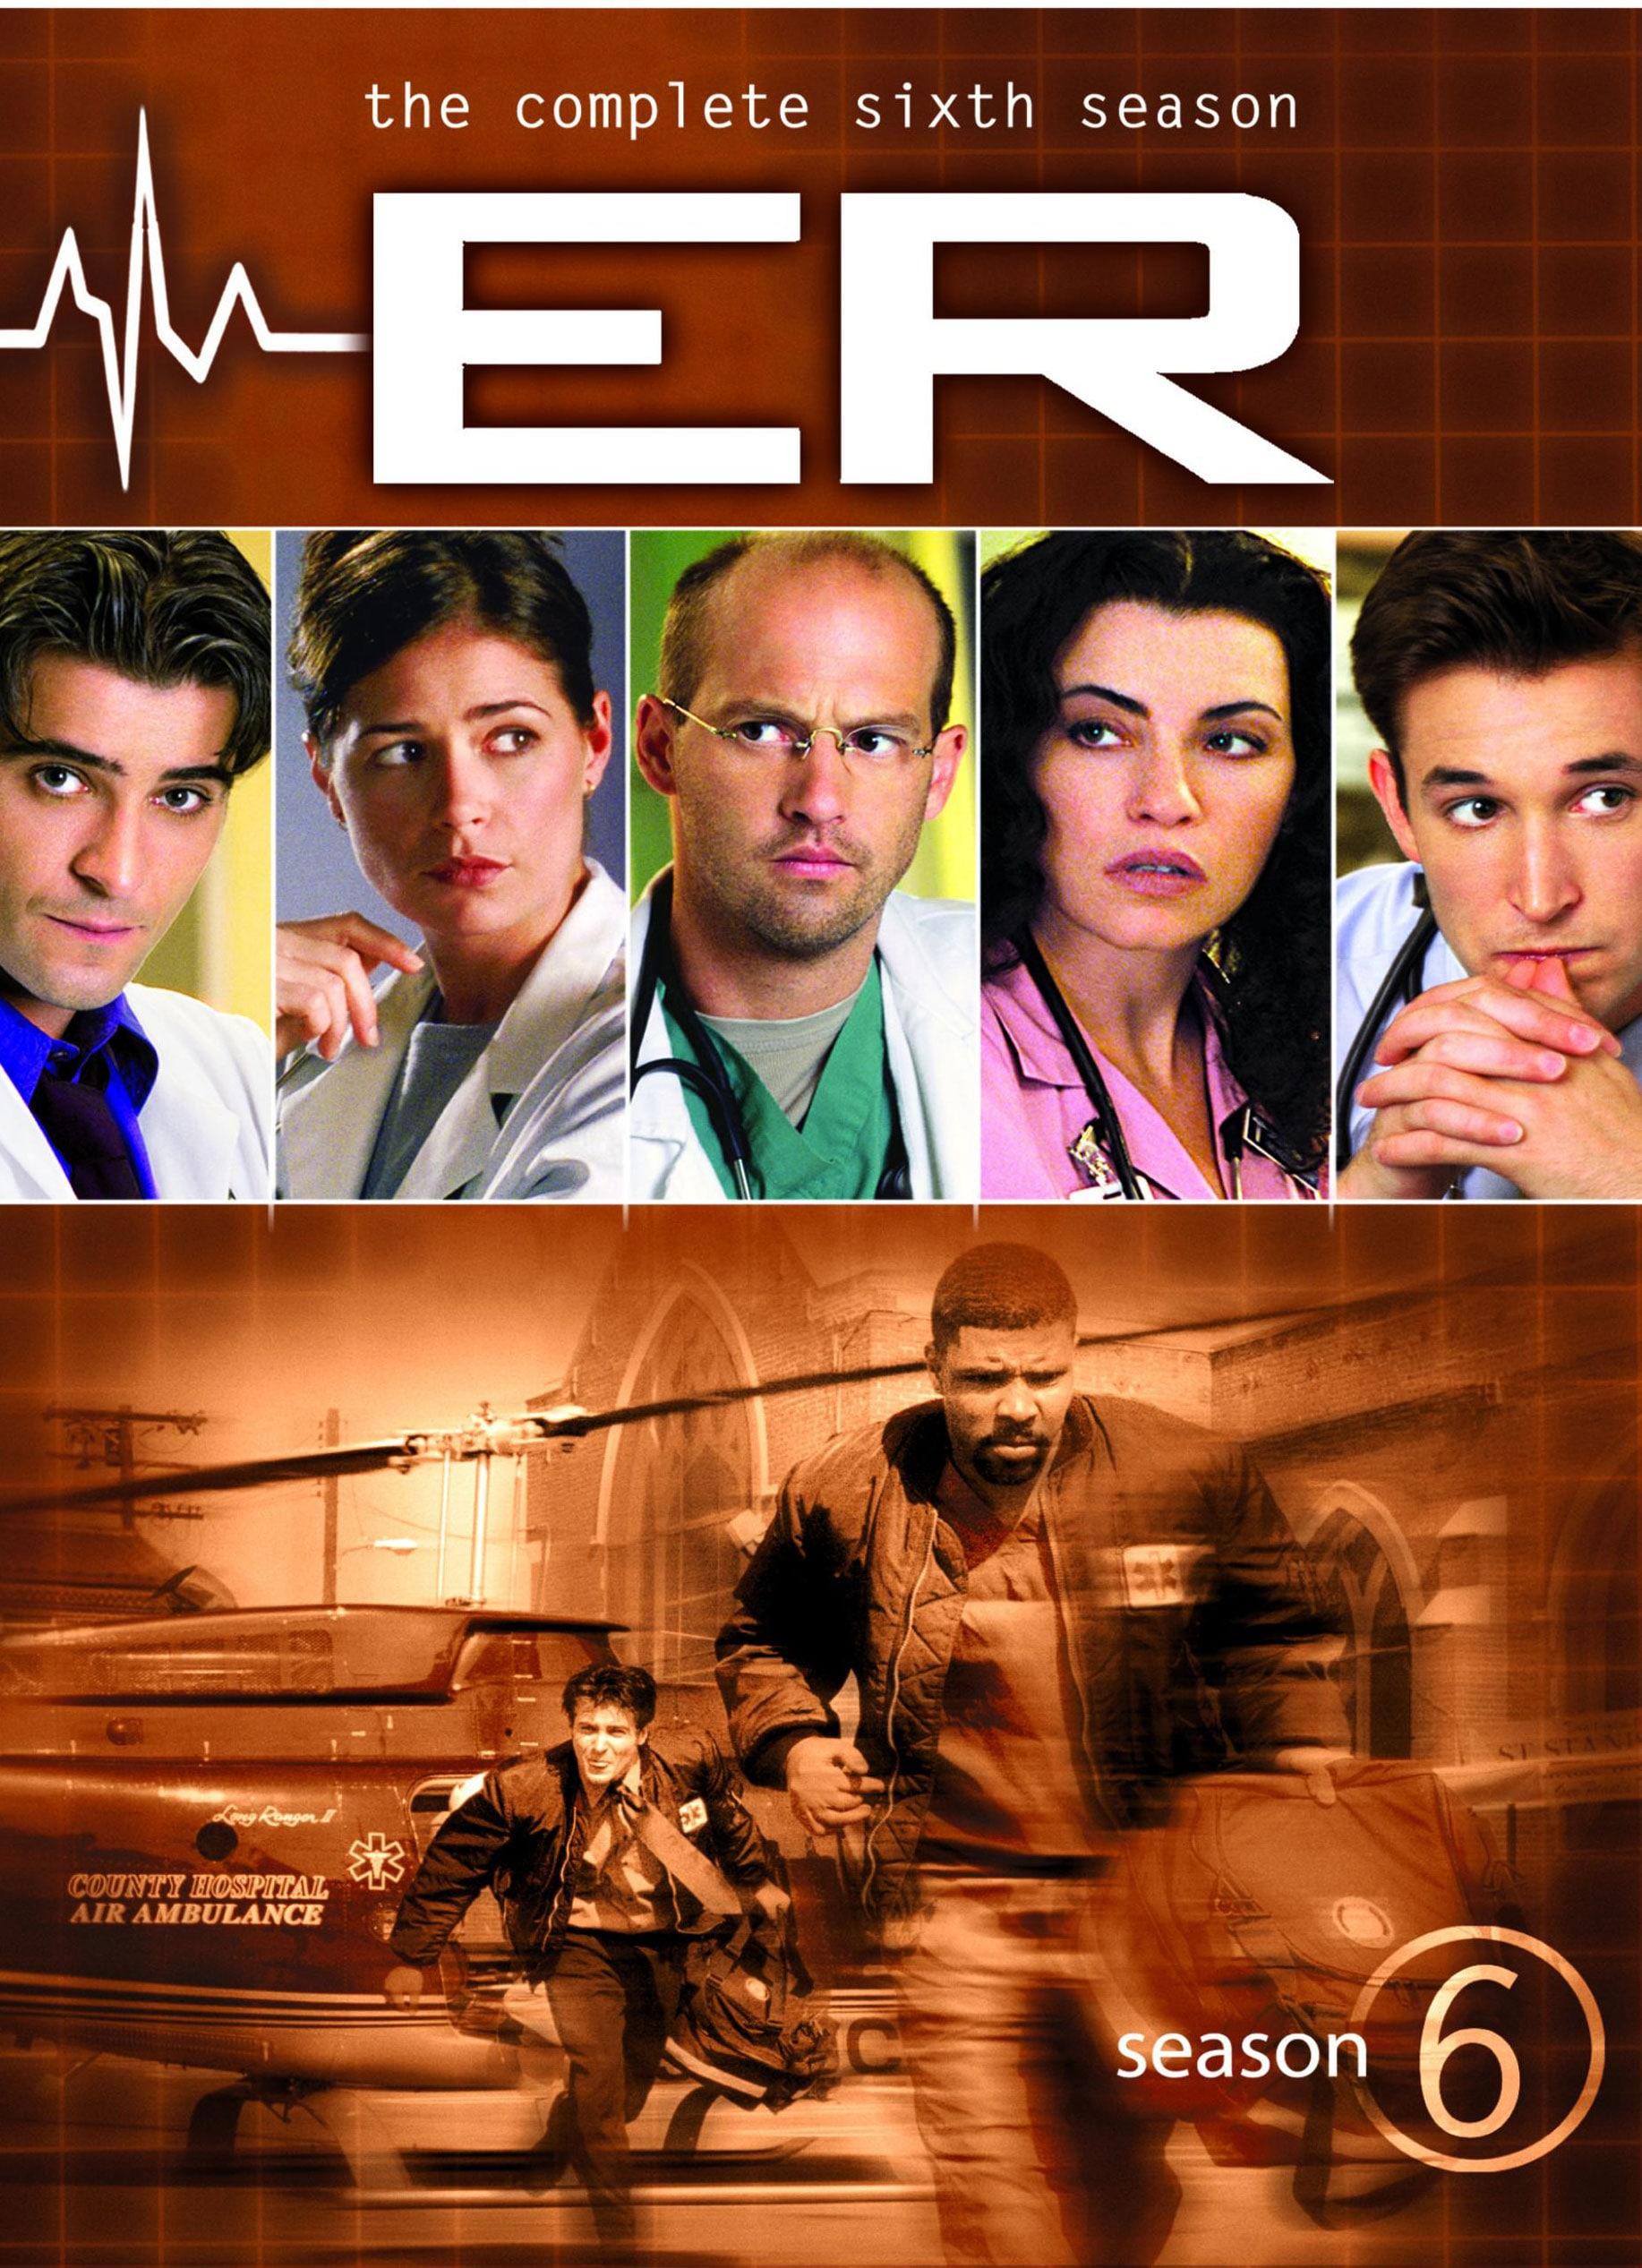 ER - The Complete Sixth Season (DVD)